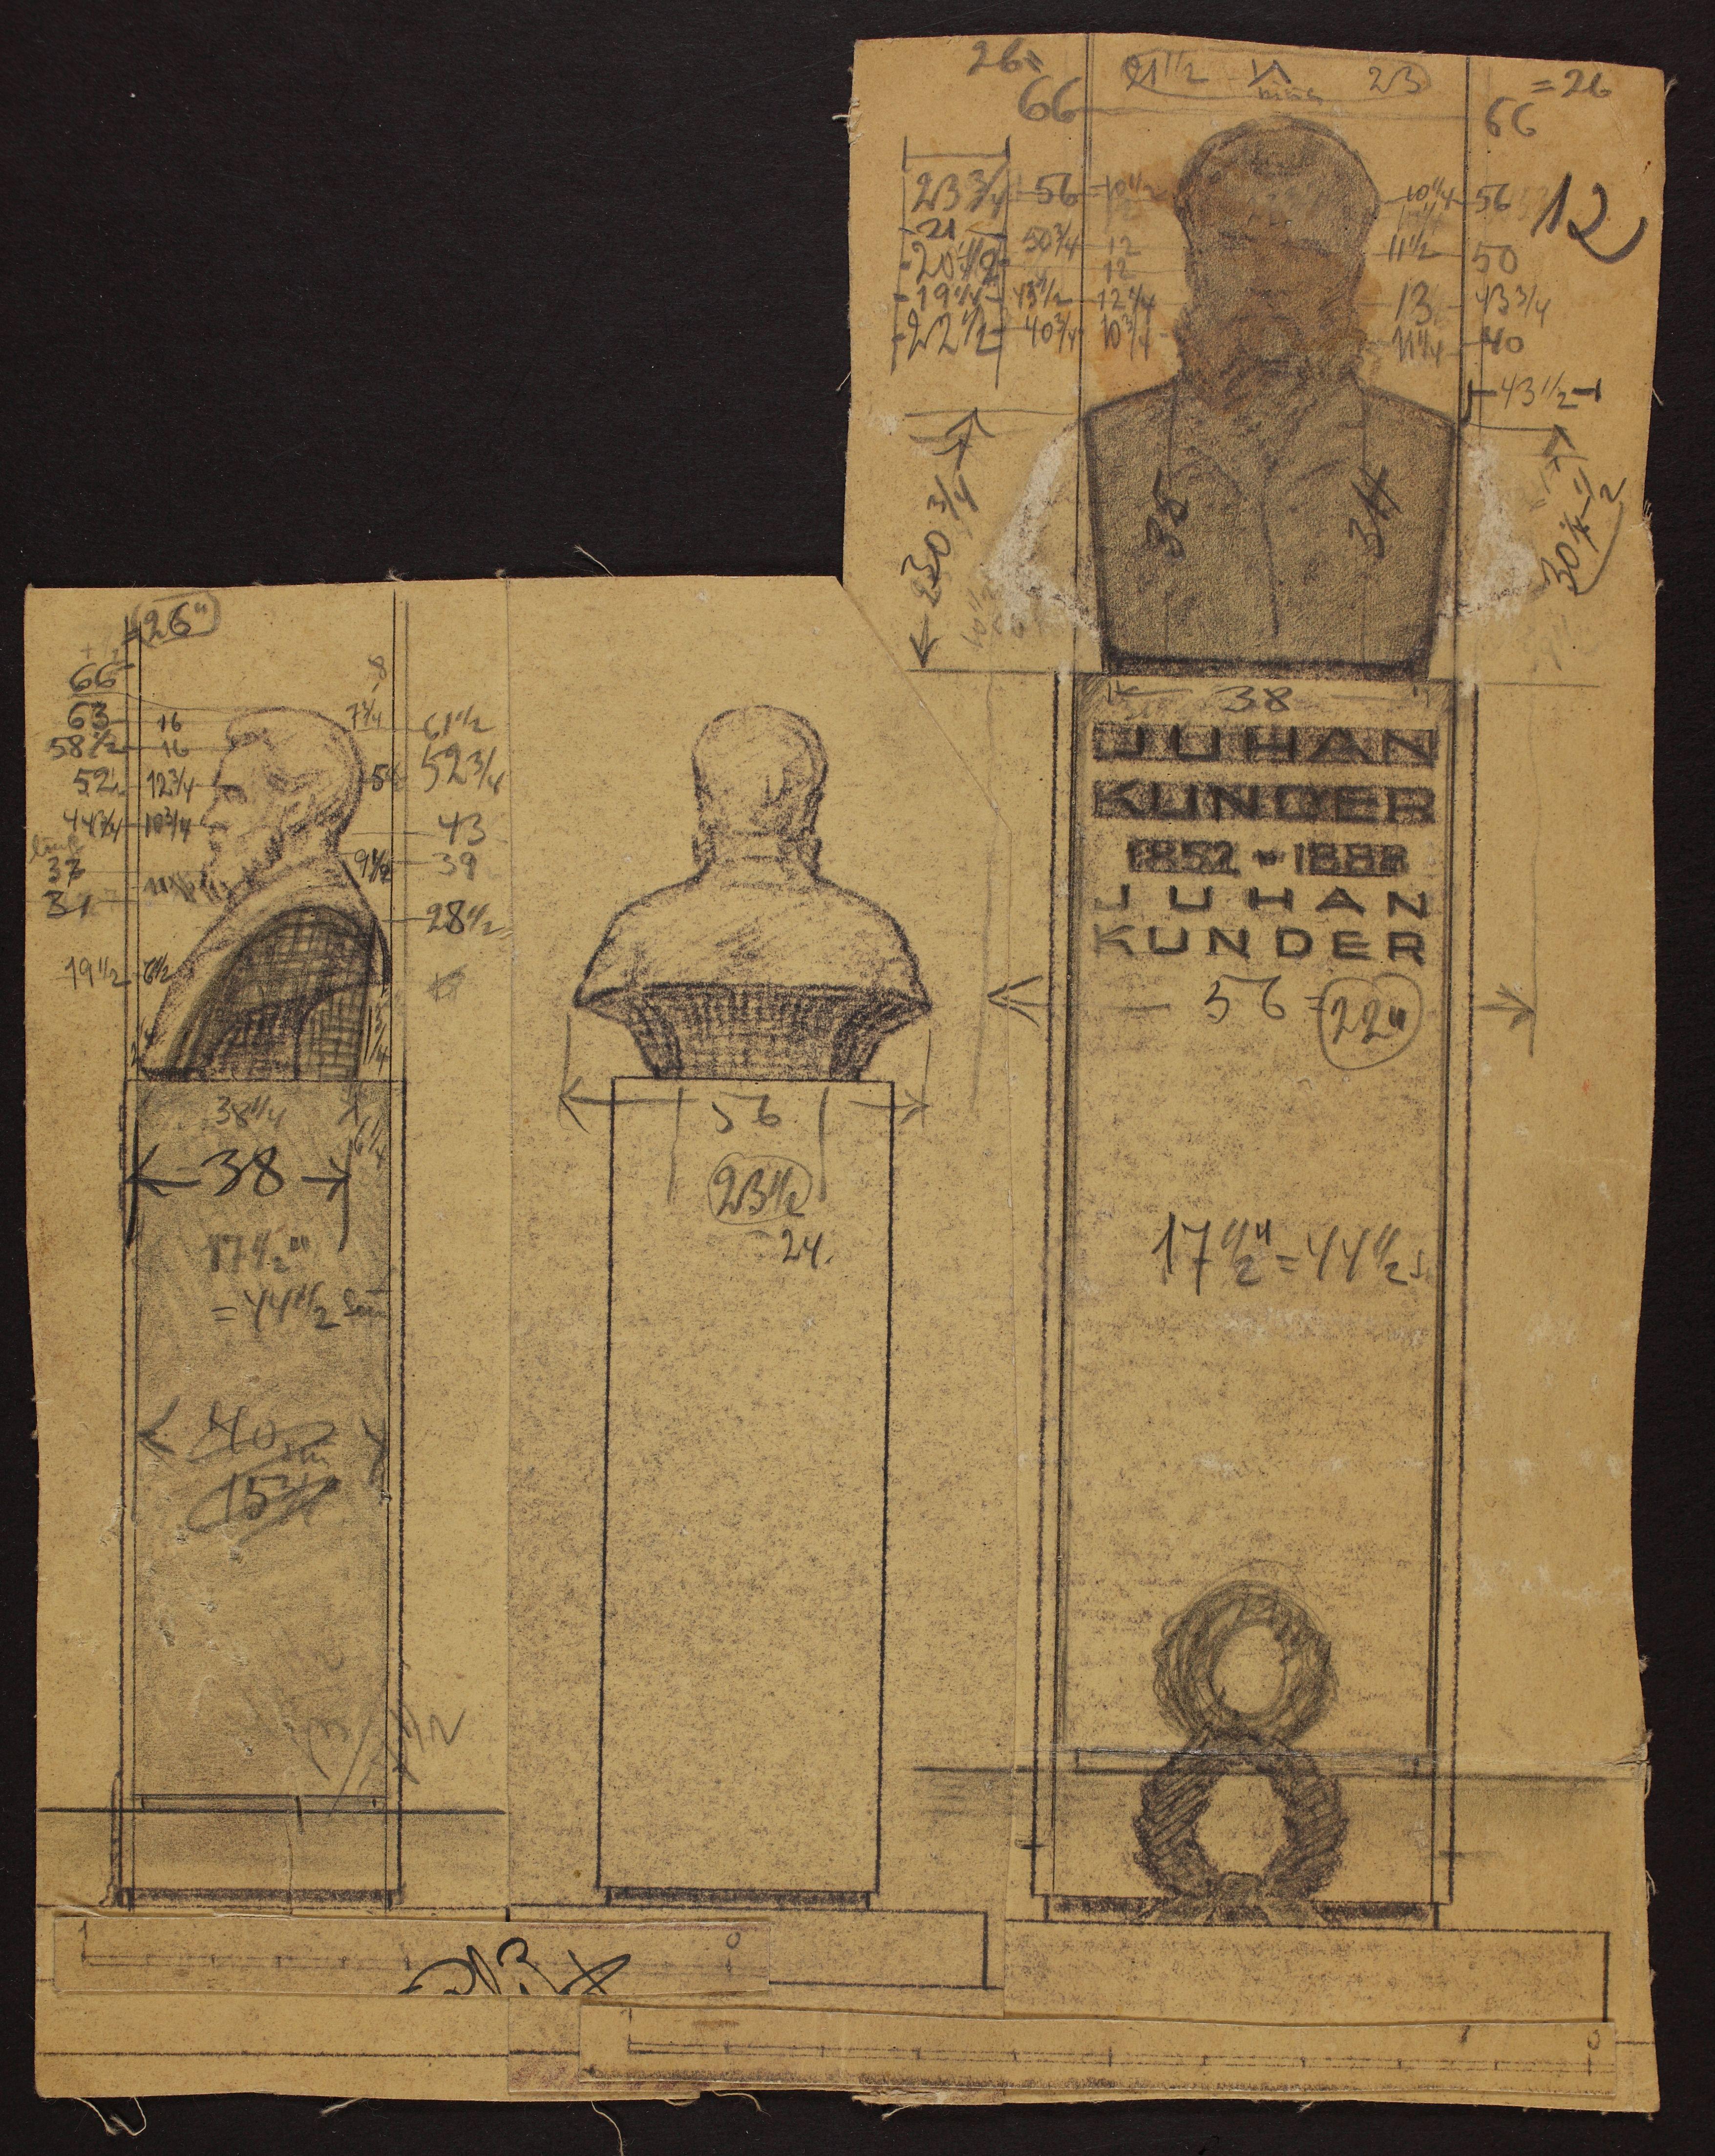 J. Kunderi monumendi projekt, 1937. ERA.R-1903.1.8.12